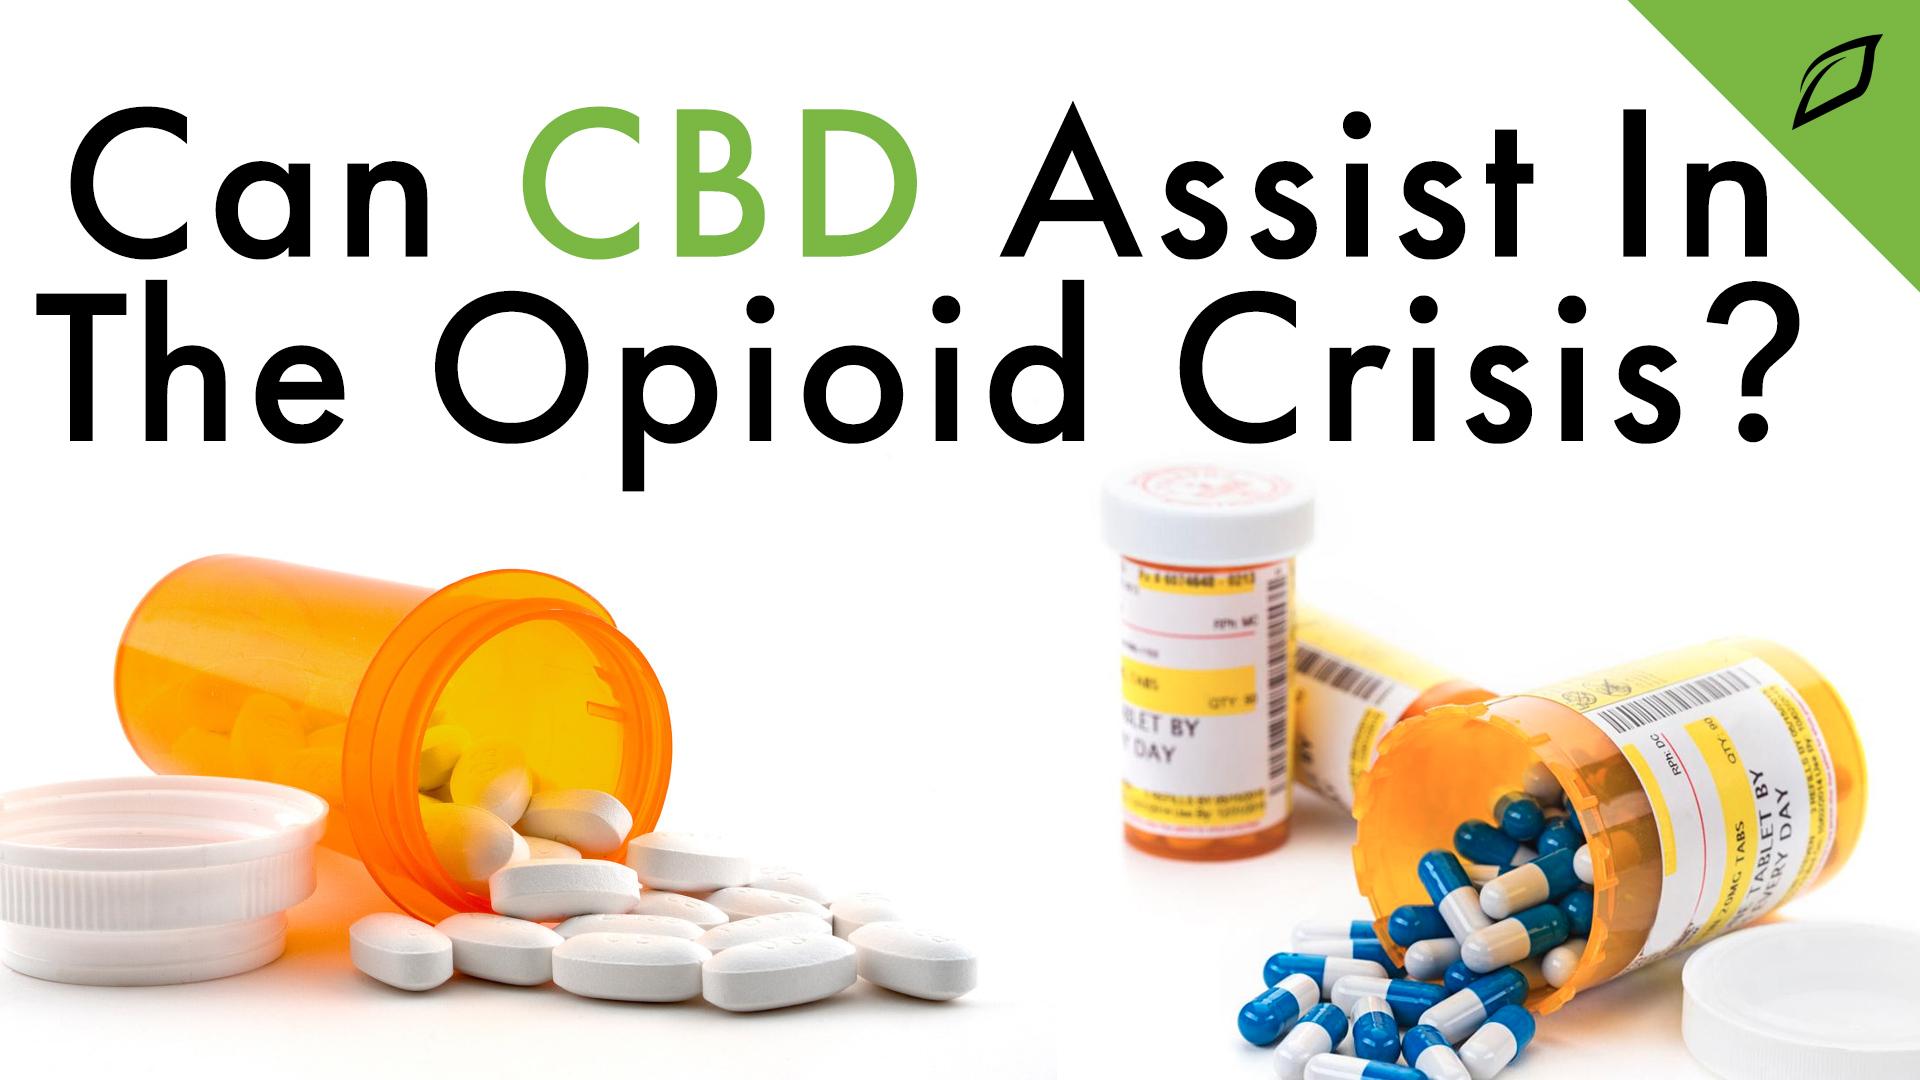 Opioid Crisis Blog 16x9